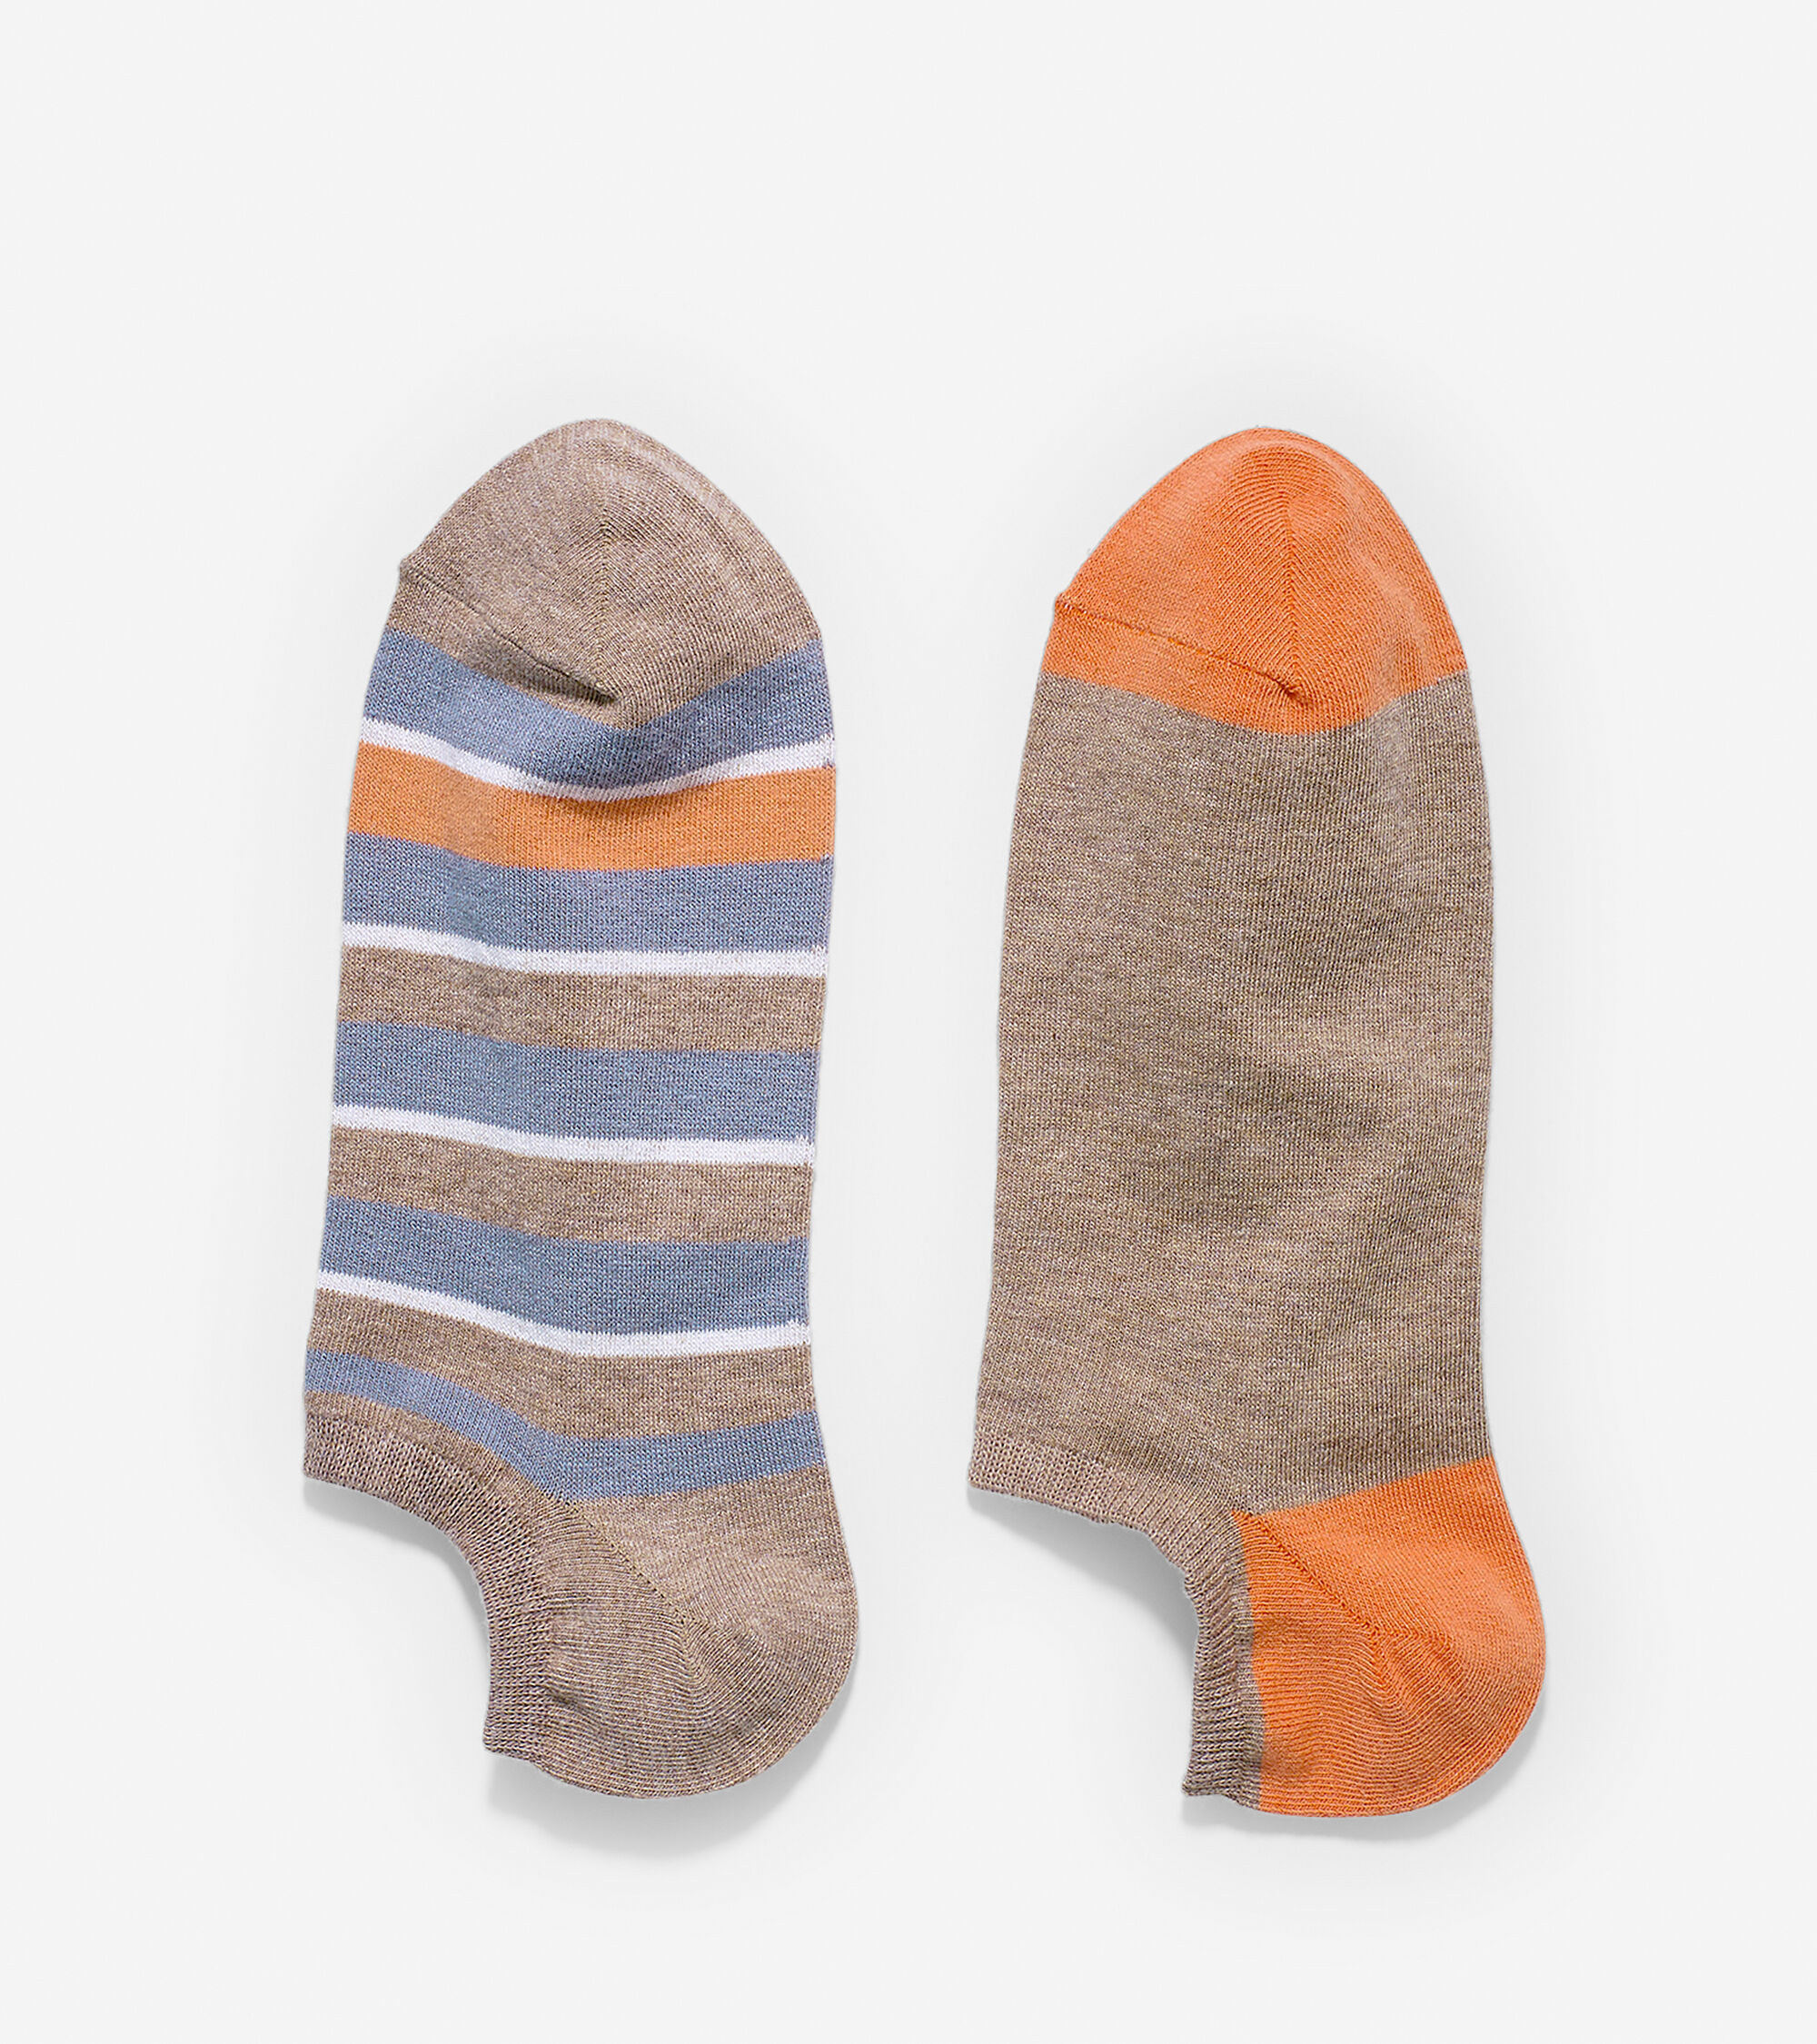 Accessories > Village Stripe Low Cut Socks - 2 Pack